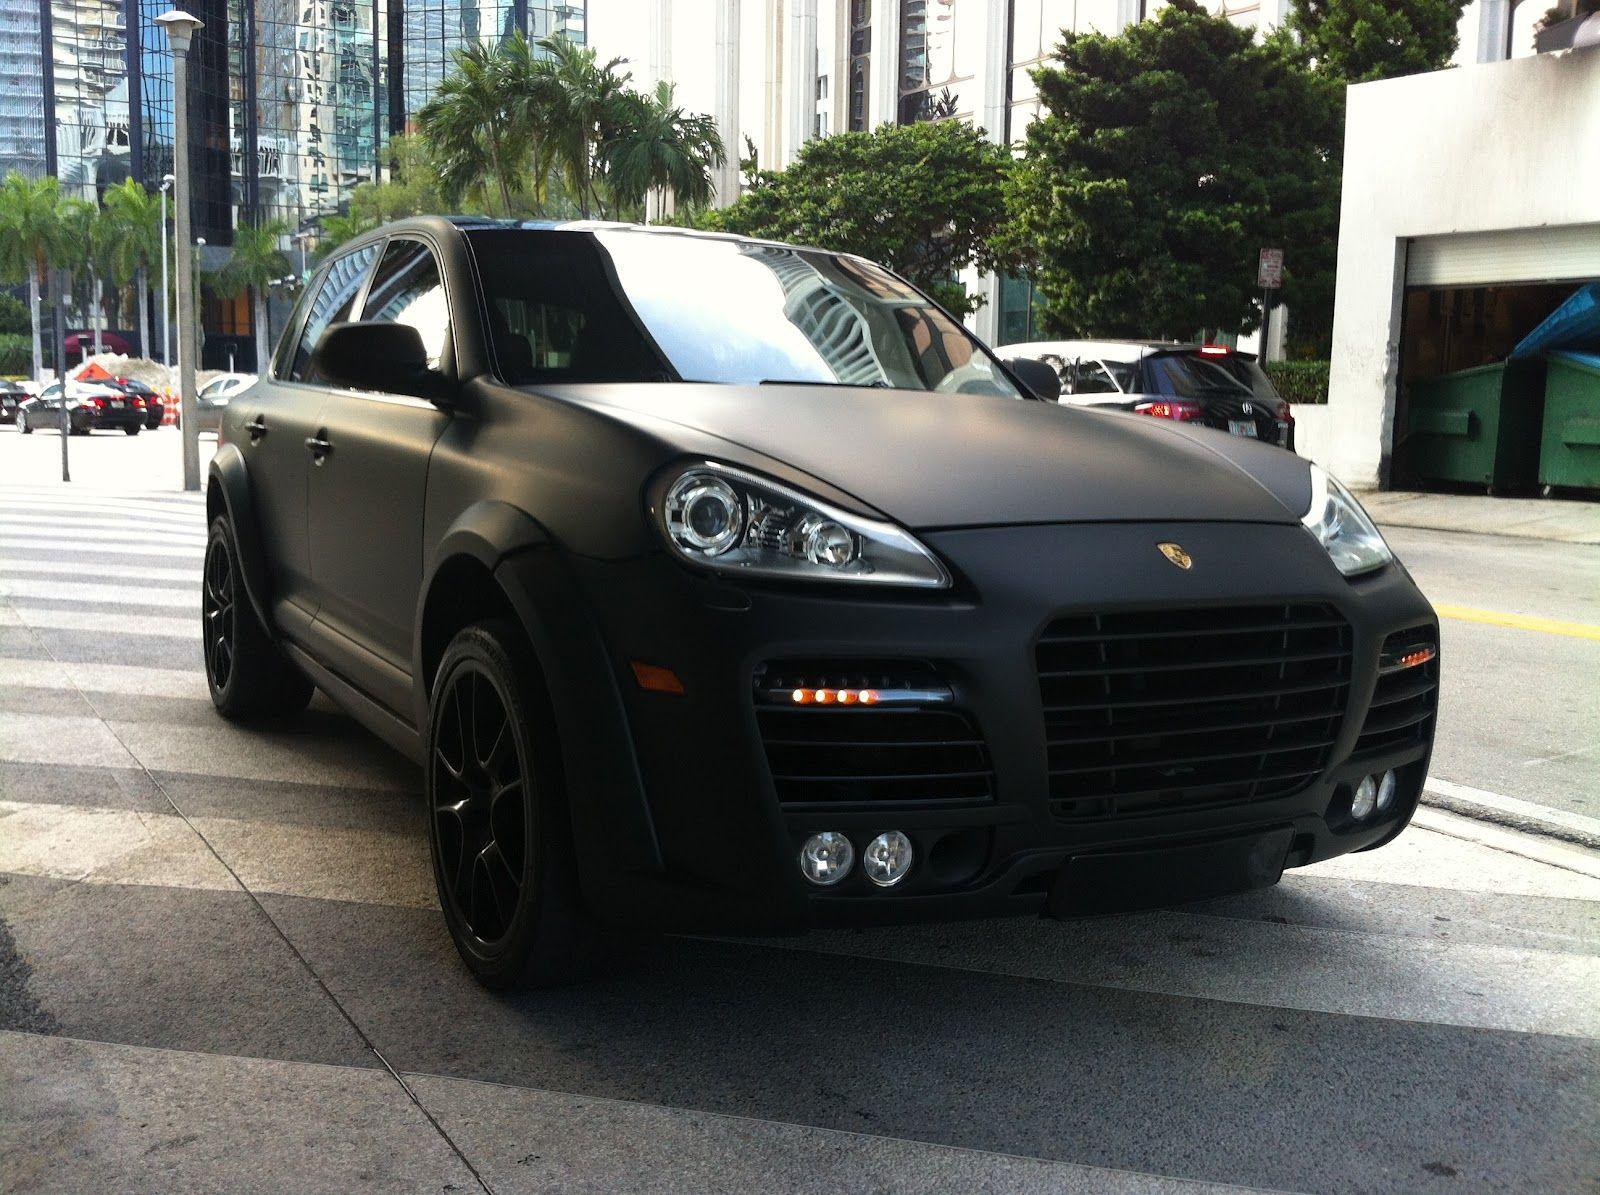 Awesome porsche cayenne 2013 black car images hd matte black porsche cayenne turbo with body kit black rims